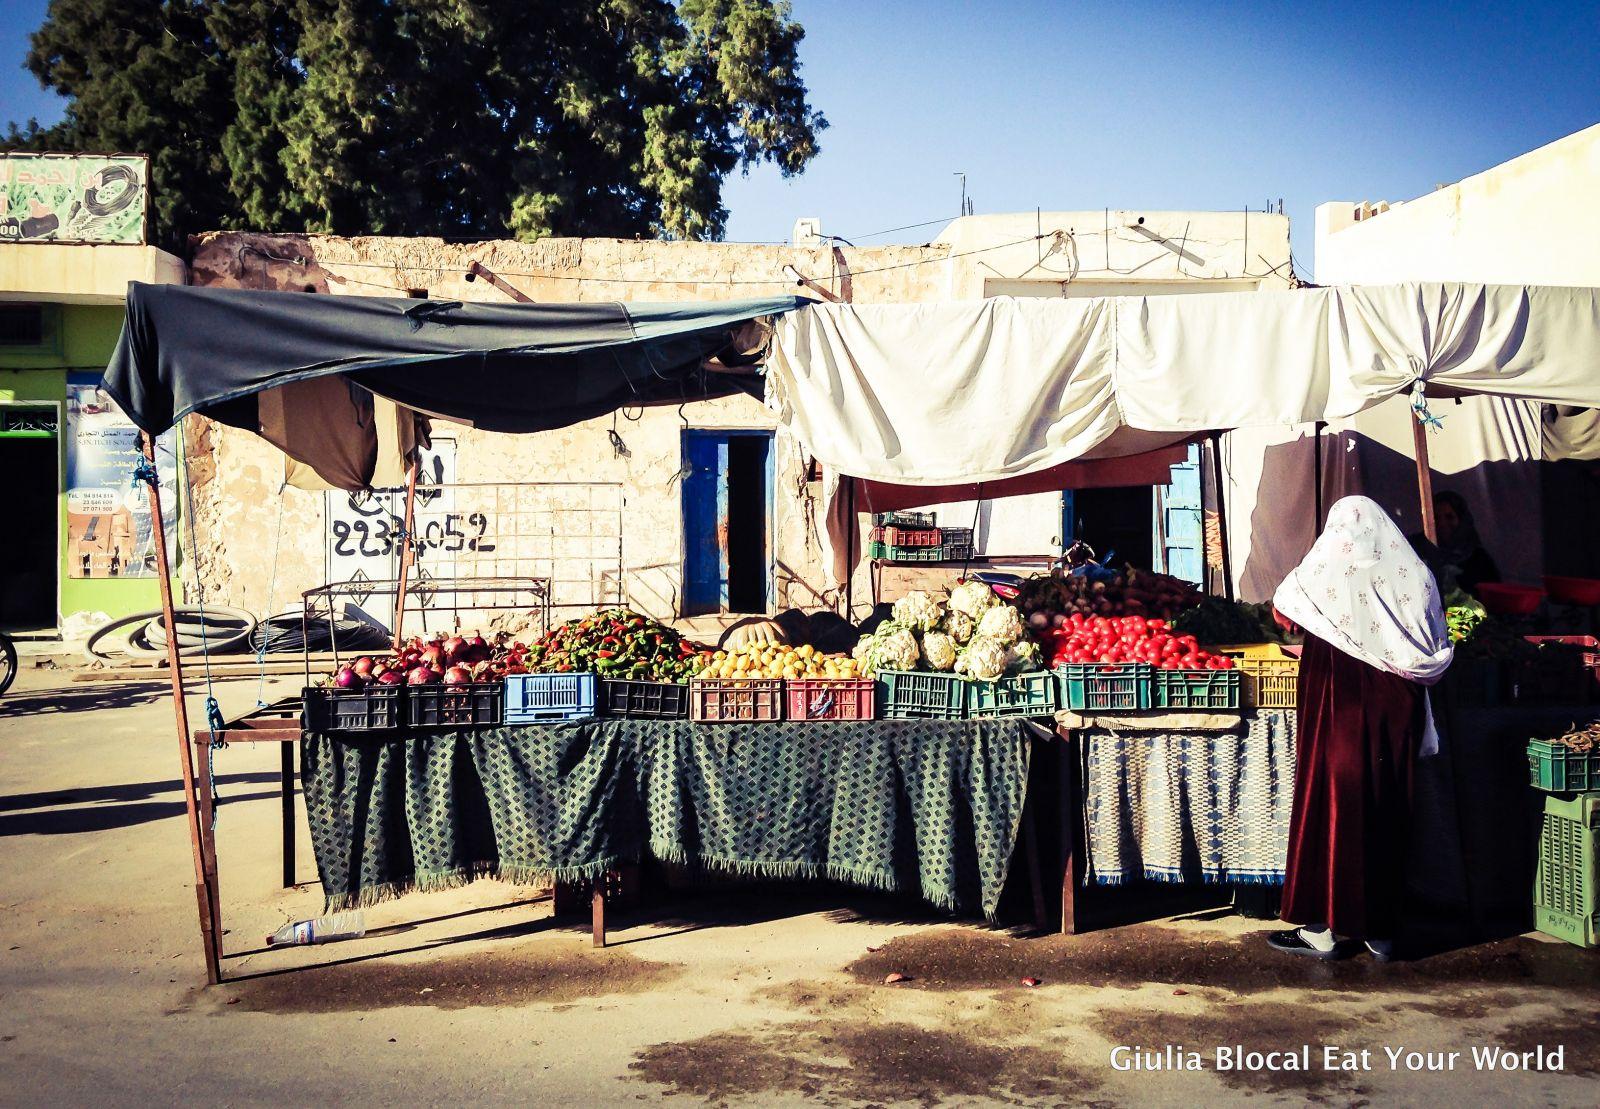 Market scene in Douz, Tunisia